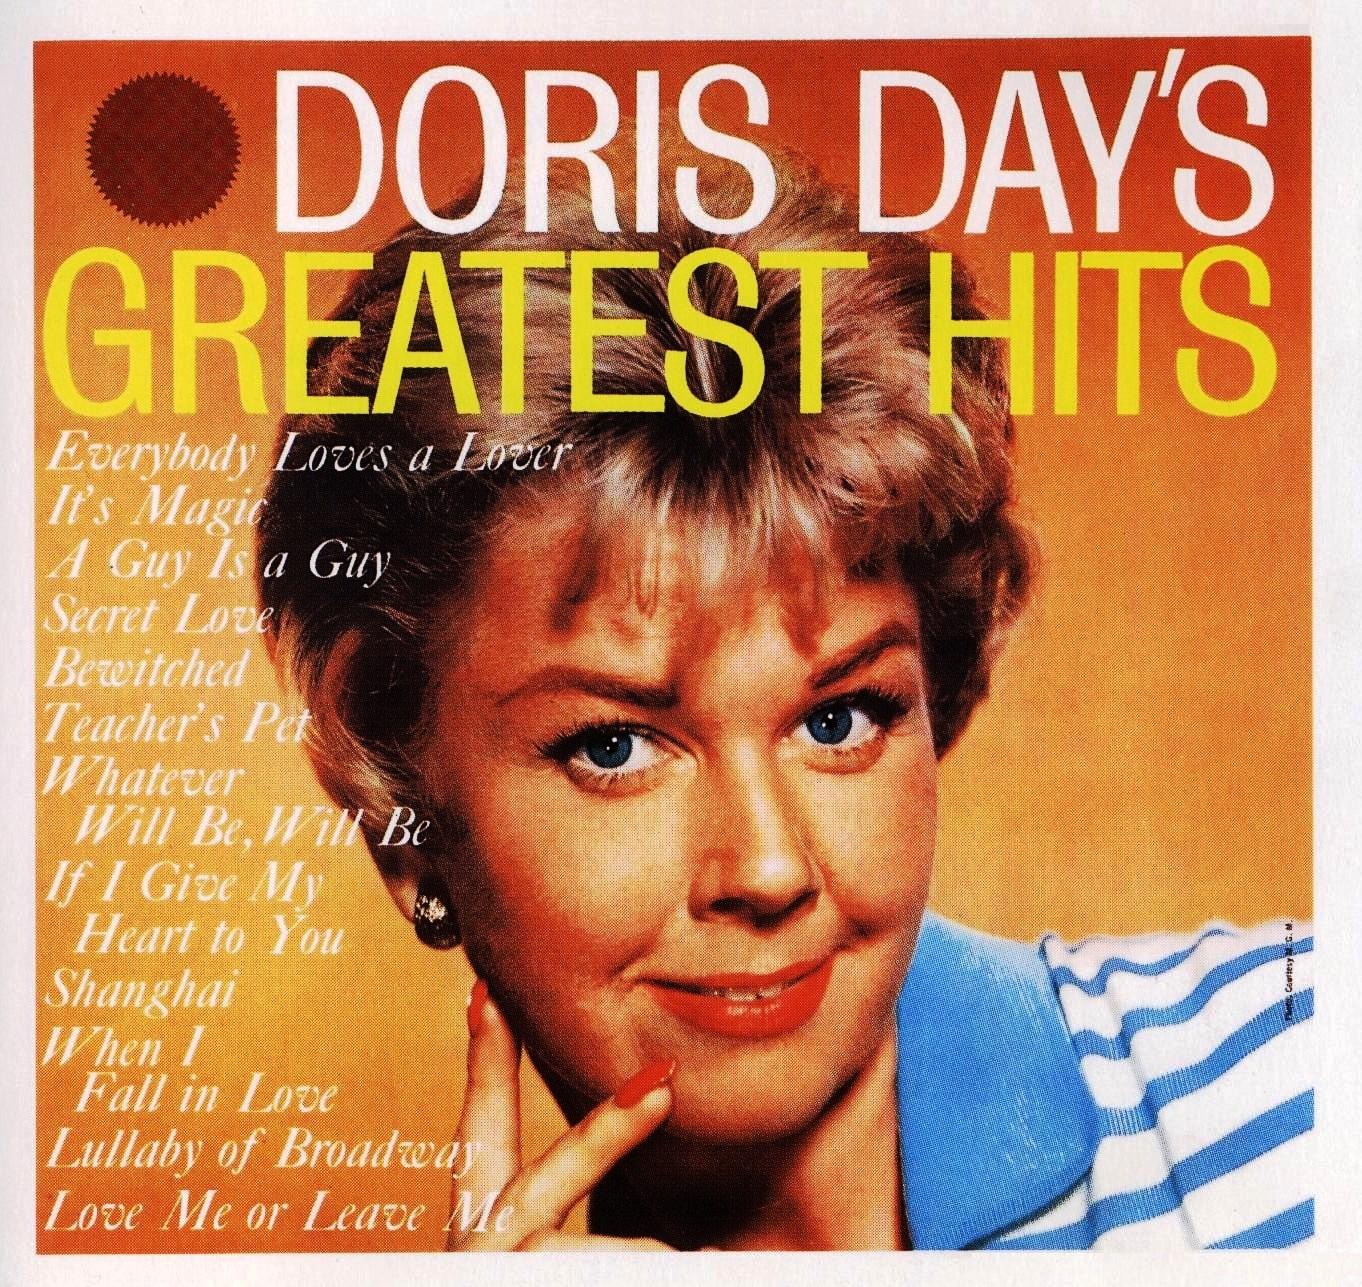 http://2.bp.blogspot.com/-y05ZjMIy_50/Tn30DmFzA2I/AAAAAAAACDI/Fz149kLgW0M/s1600/Greatest+Hits+-+Doris+Day+%2528Front%2529+%255B1965%255D.jpg